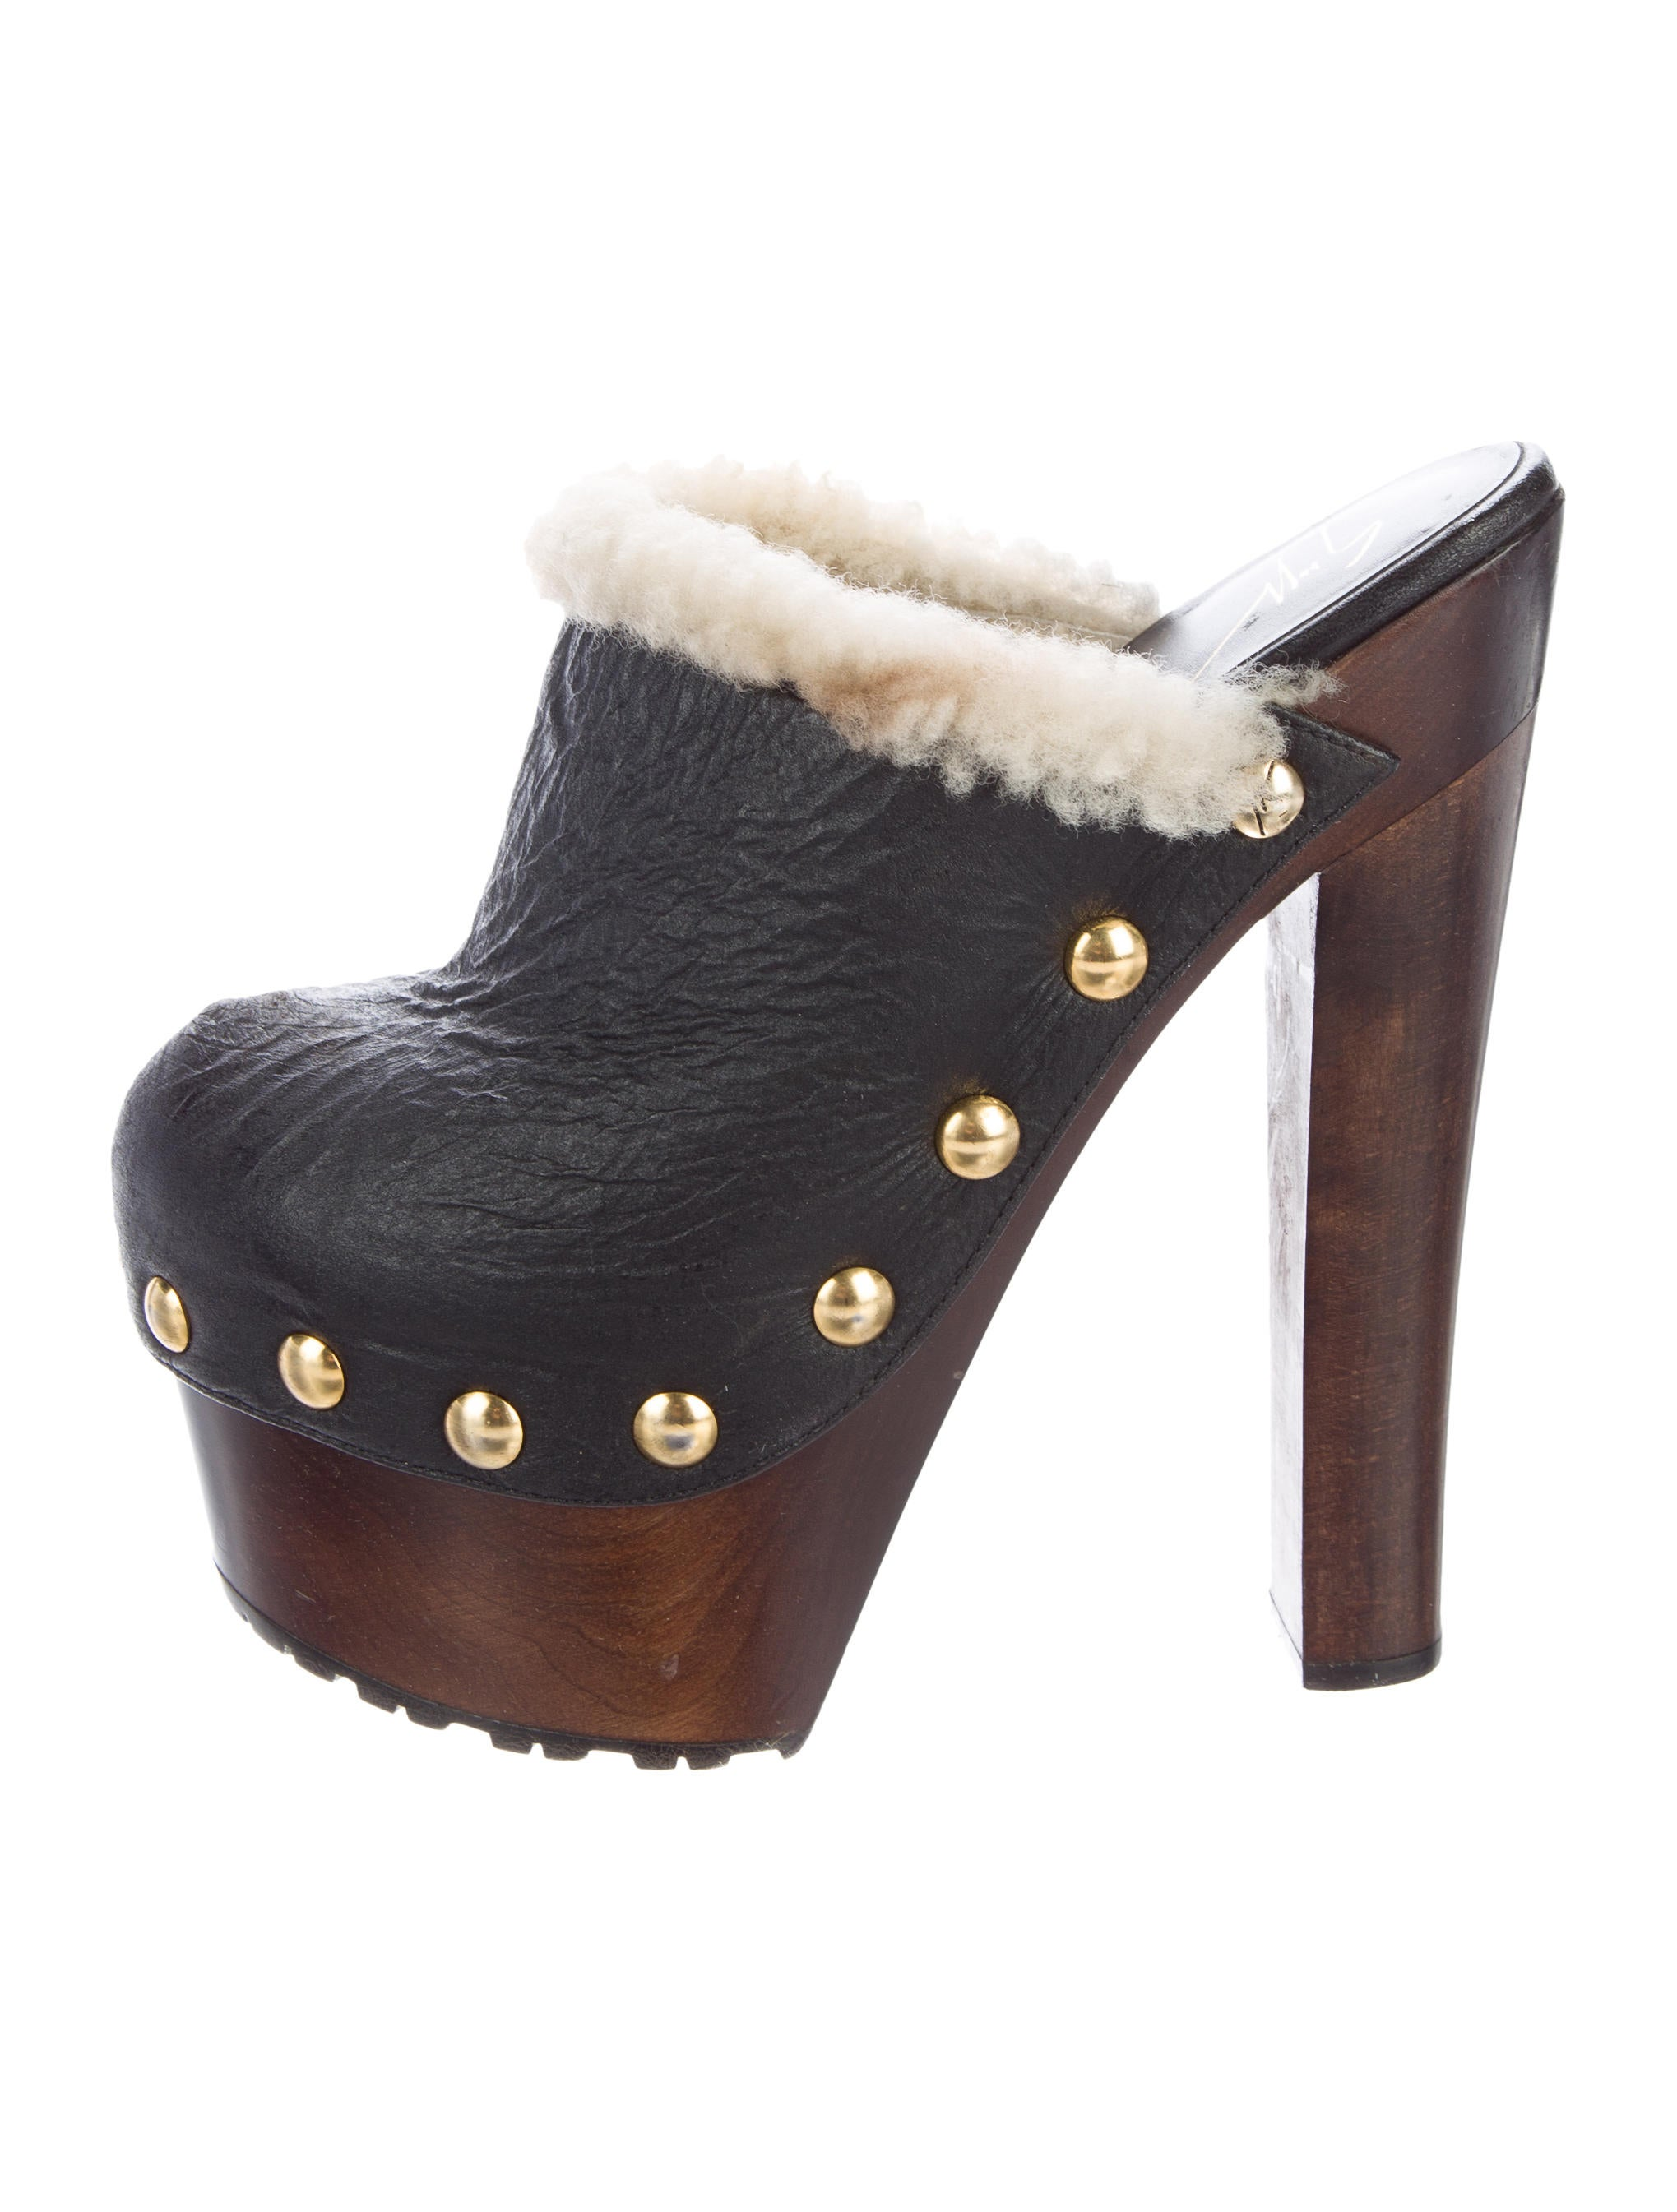 f7b2736fdc Giuseppe Zanotti Pumps Sale Gold Chain Sandals   Portal for Tenders